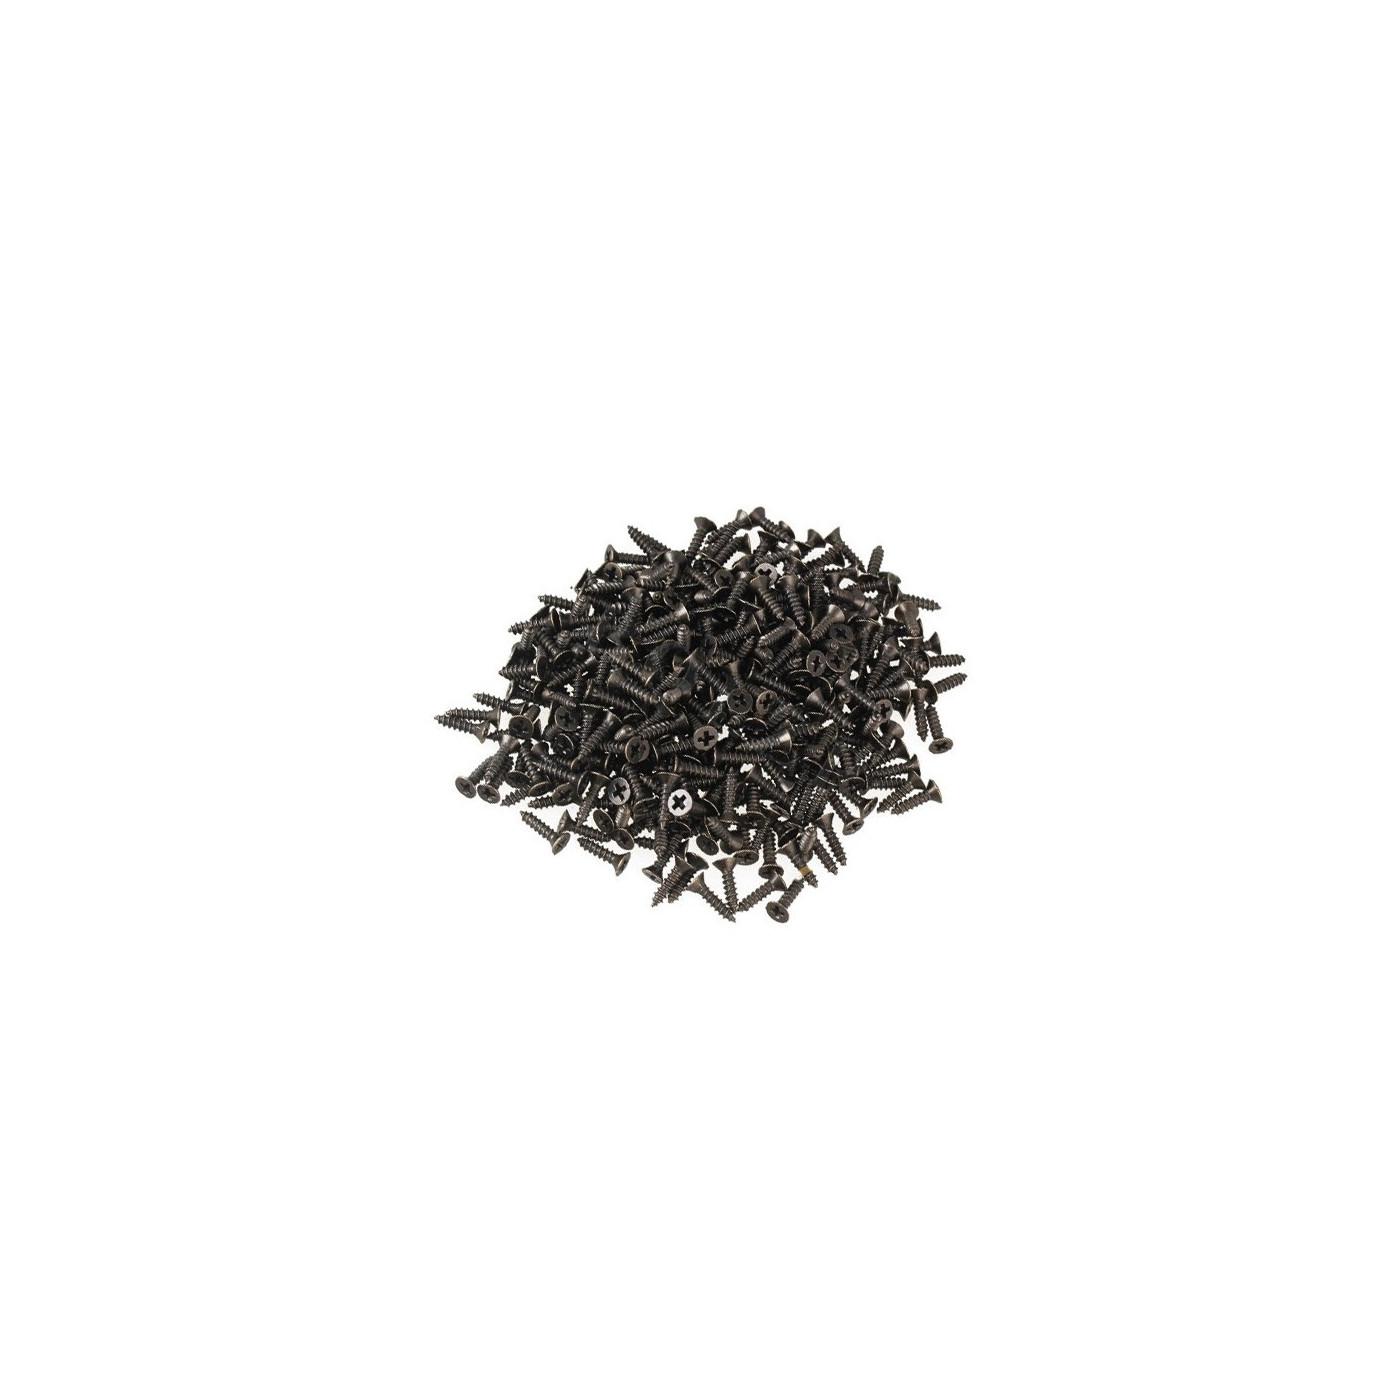 Set of 300 mini screws (2.5x10 mm, countersunk, bronze color)  - 1